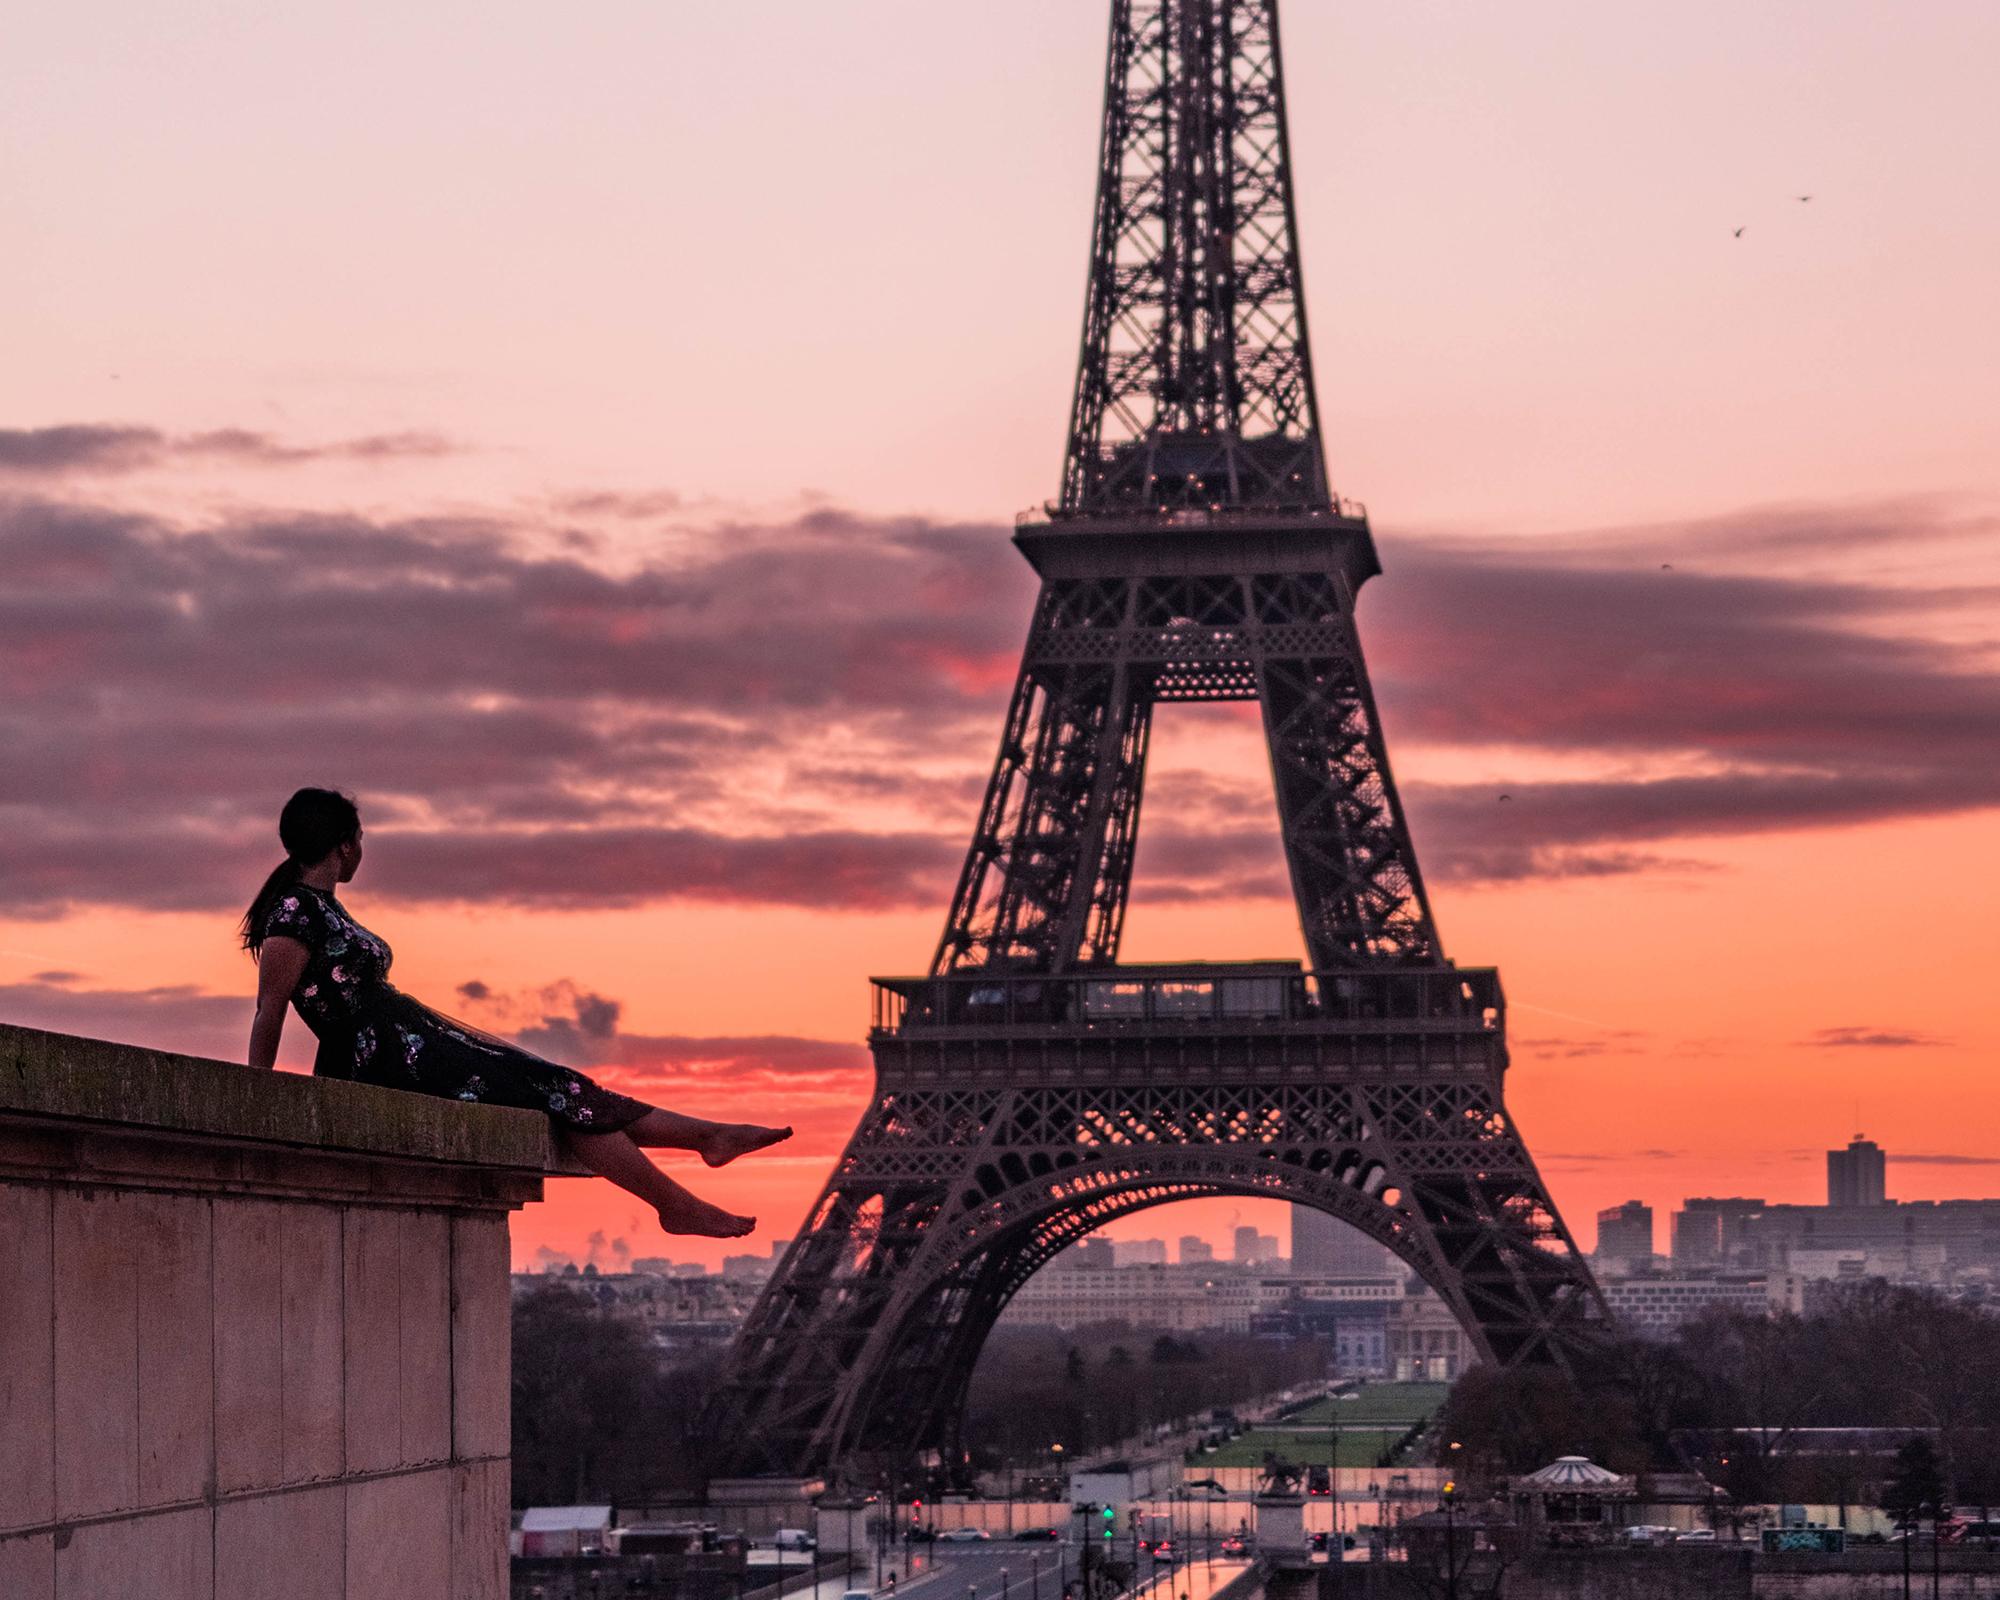 Girls Socks Mid-Calf Eiffel Tower Sunset Winter Hot For Thanksgiving Day